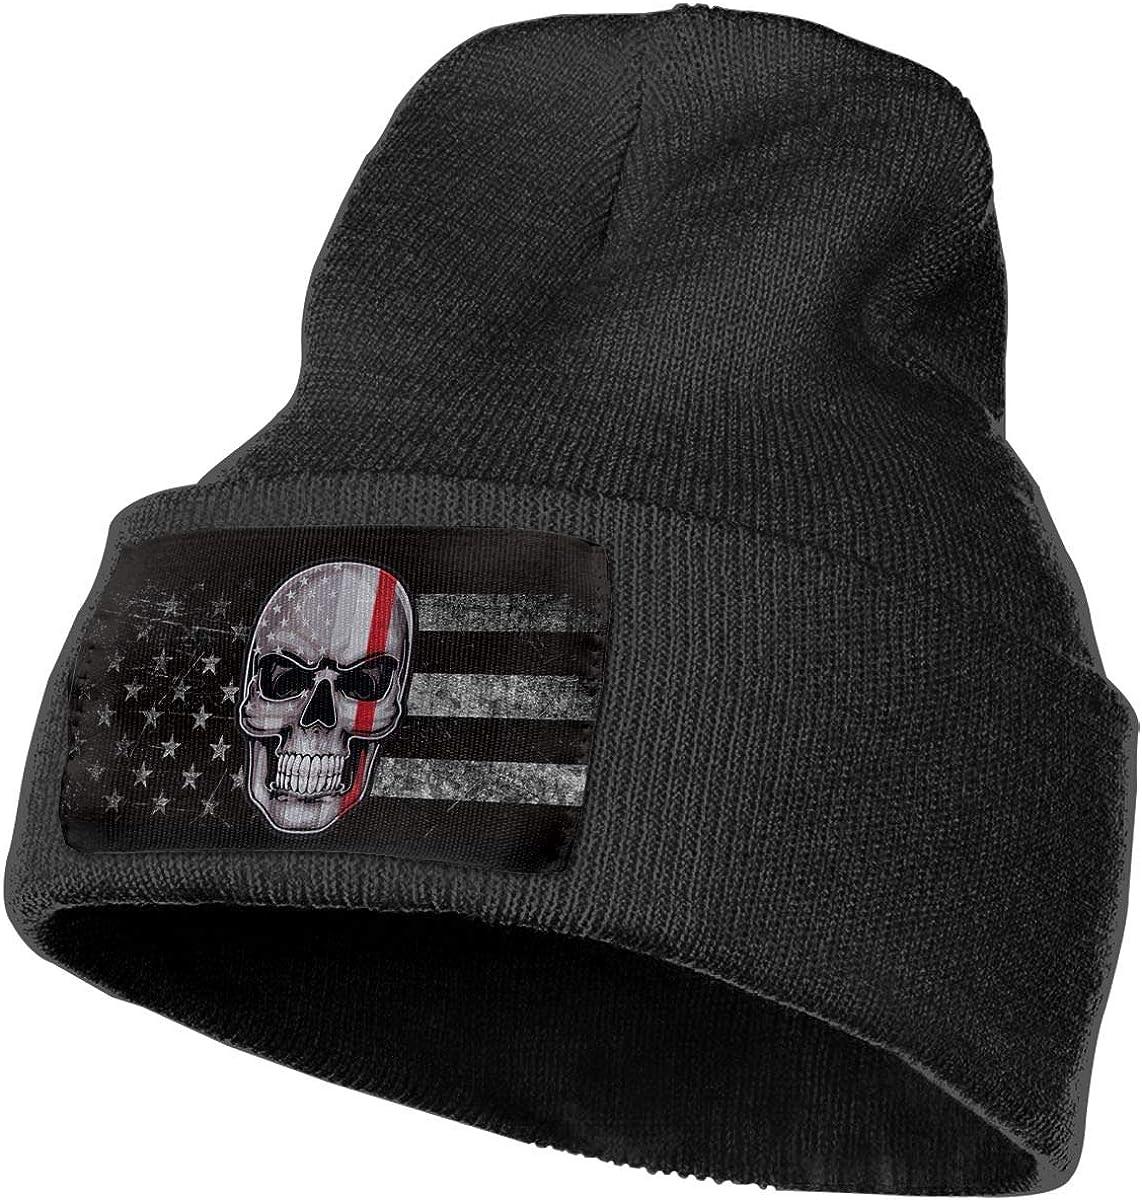 Thin Red Line Flag American Skull Mens Beanie Cap Skull Cap Winter Warm Knitting Hats.